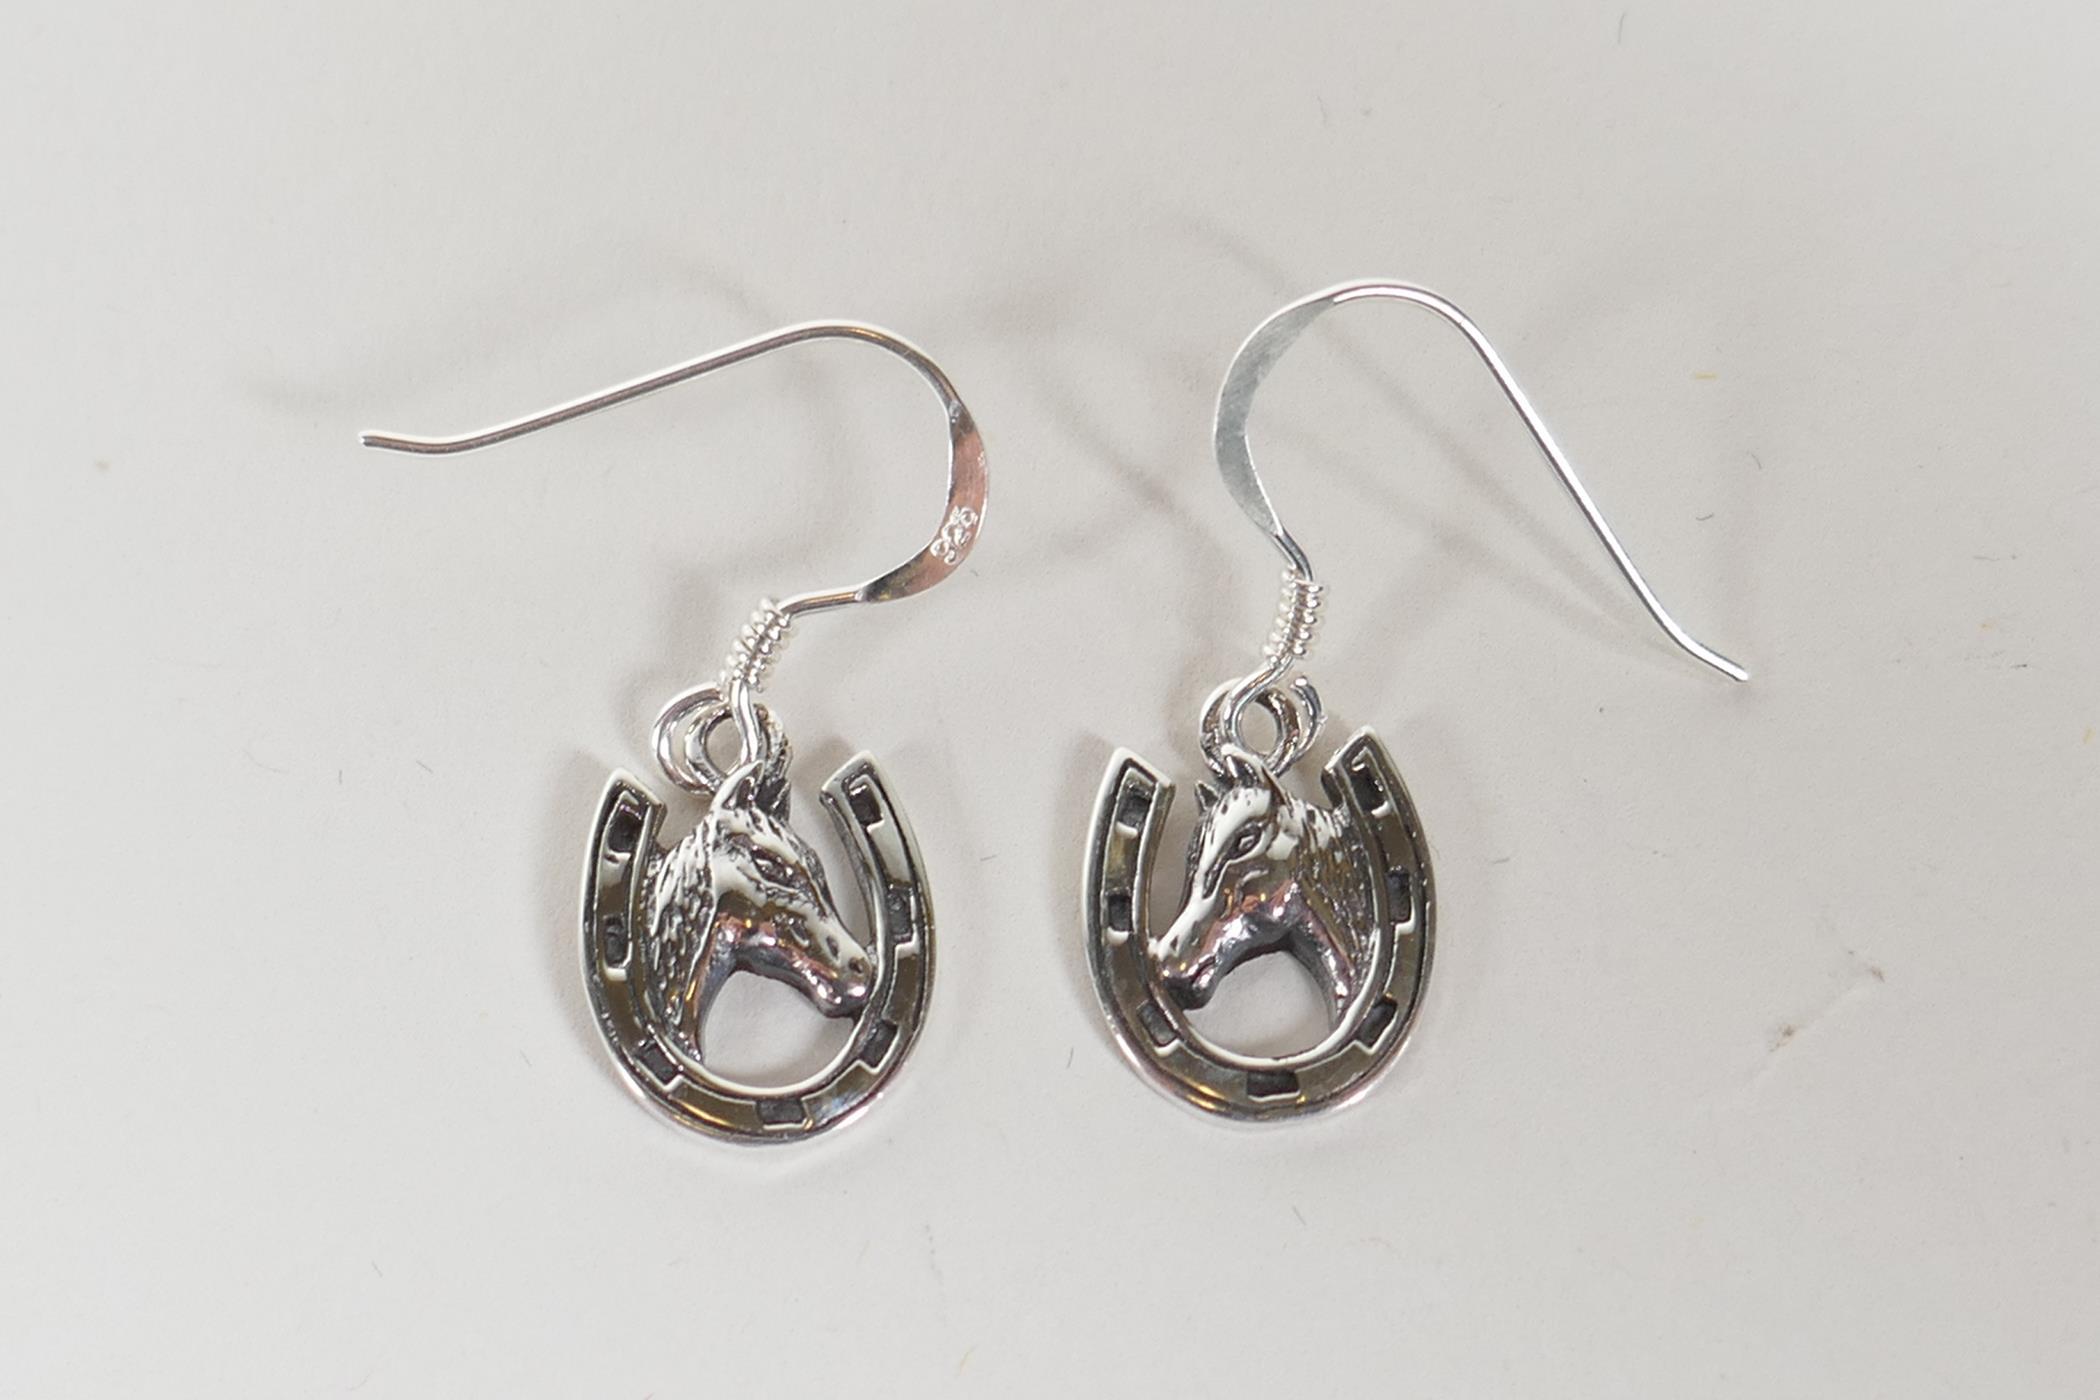 A pair of 925 silver horseshoe drop earrings